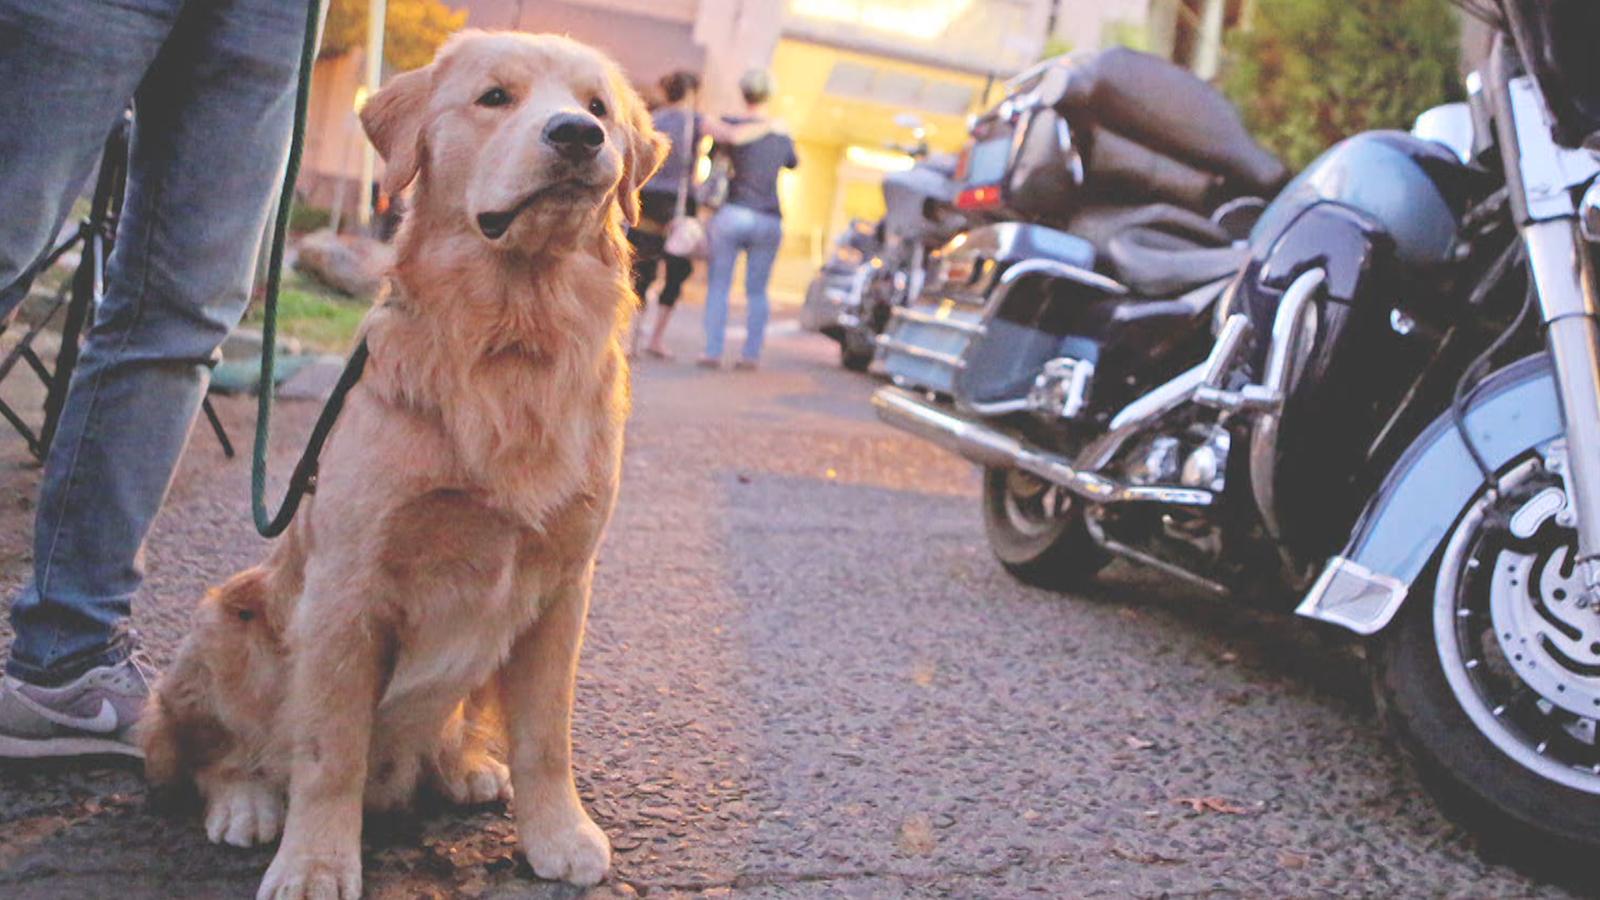 Pets GO! Doggy Trip Episode 5